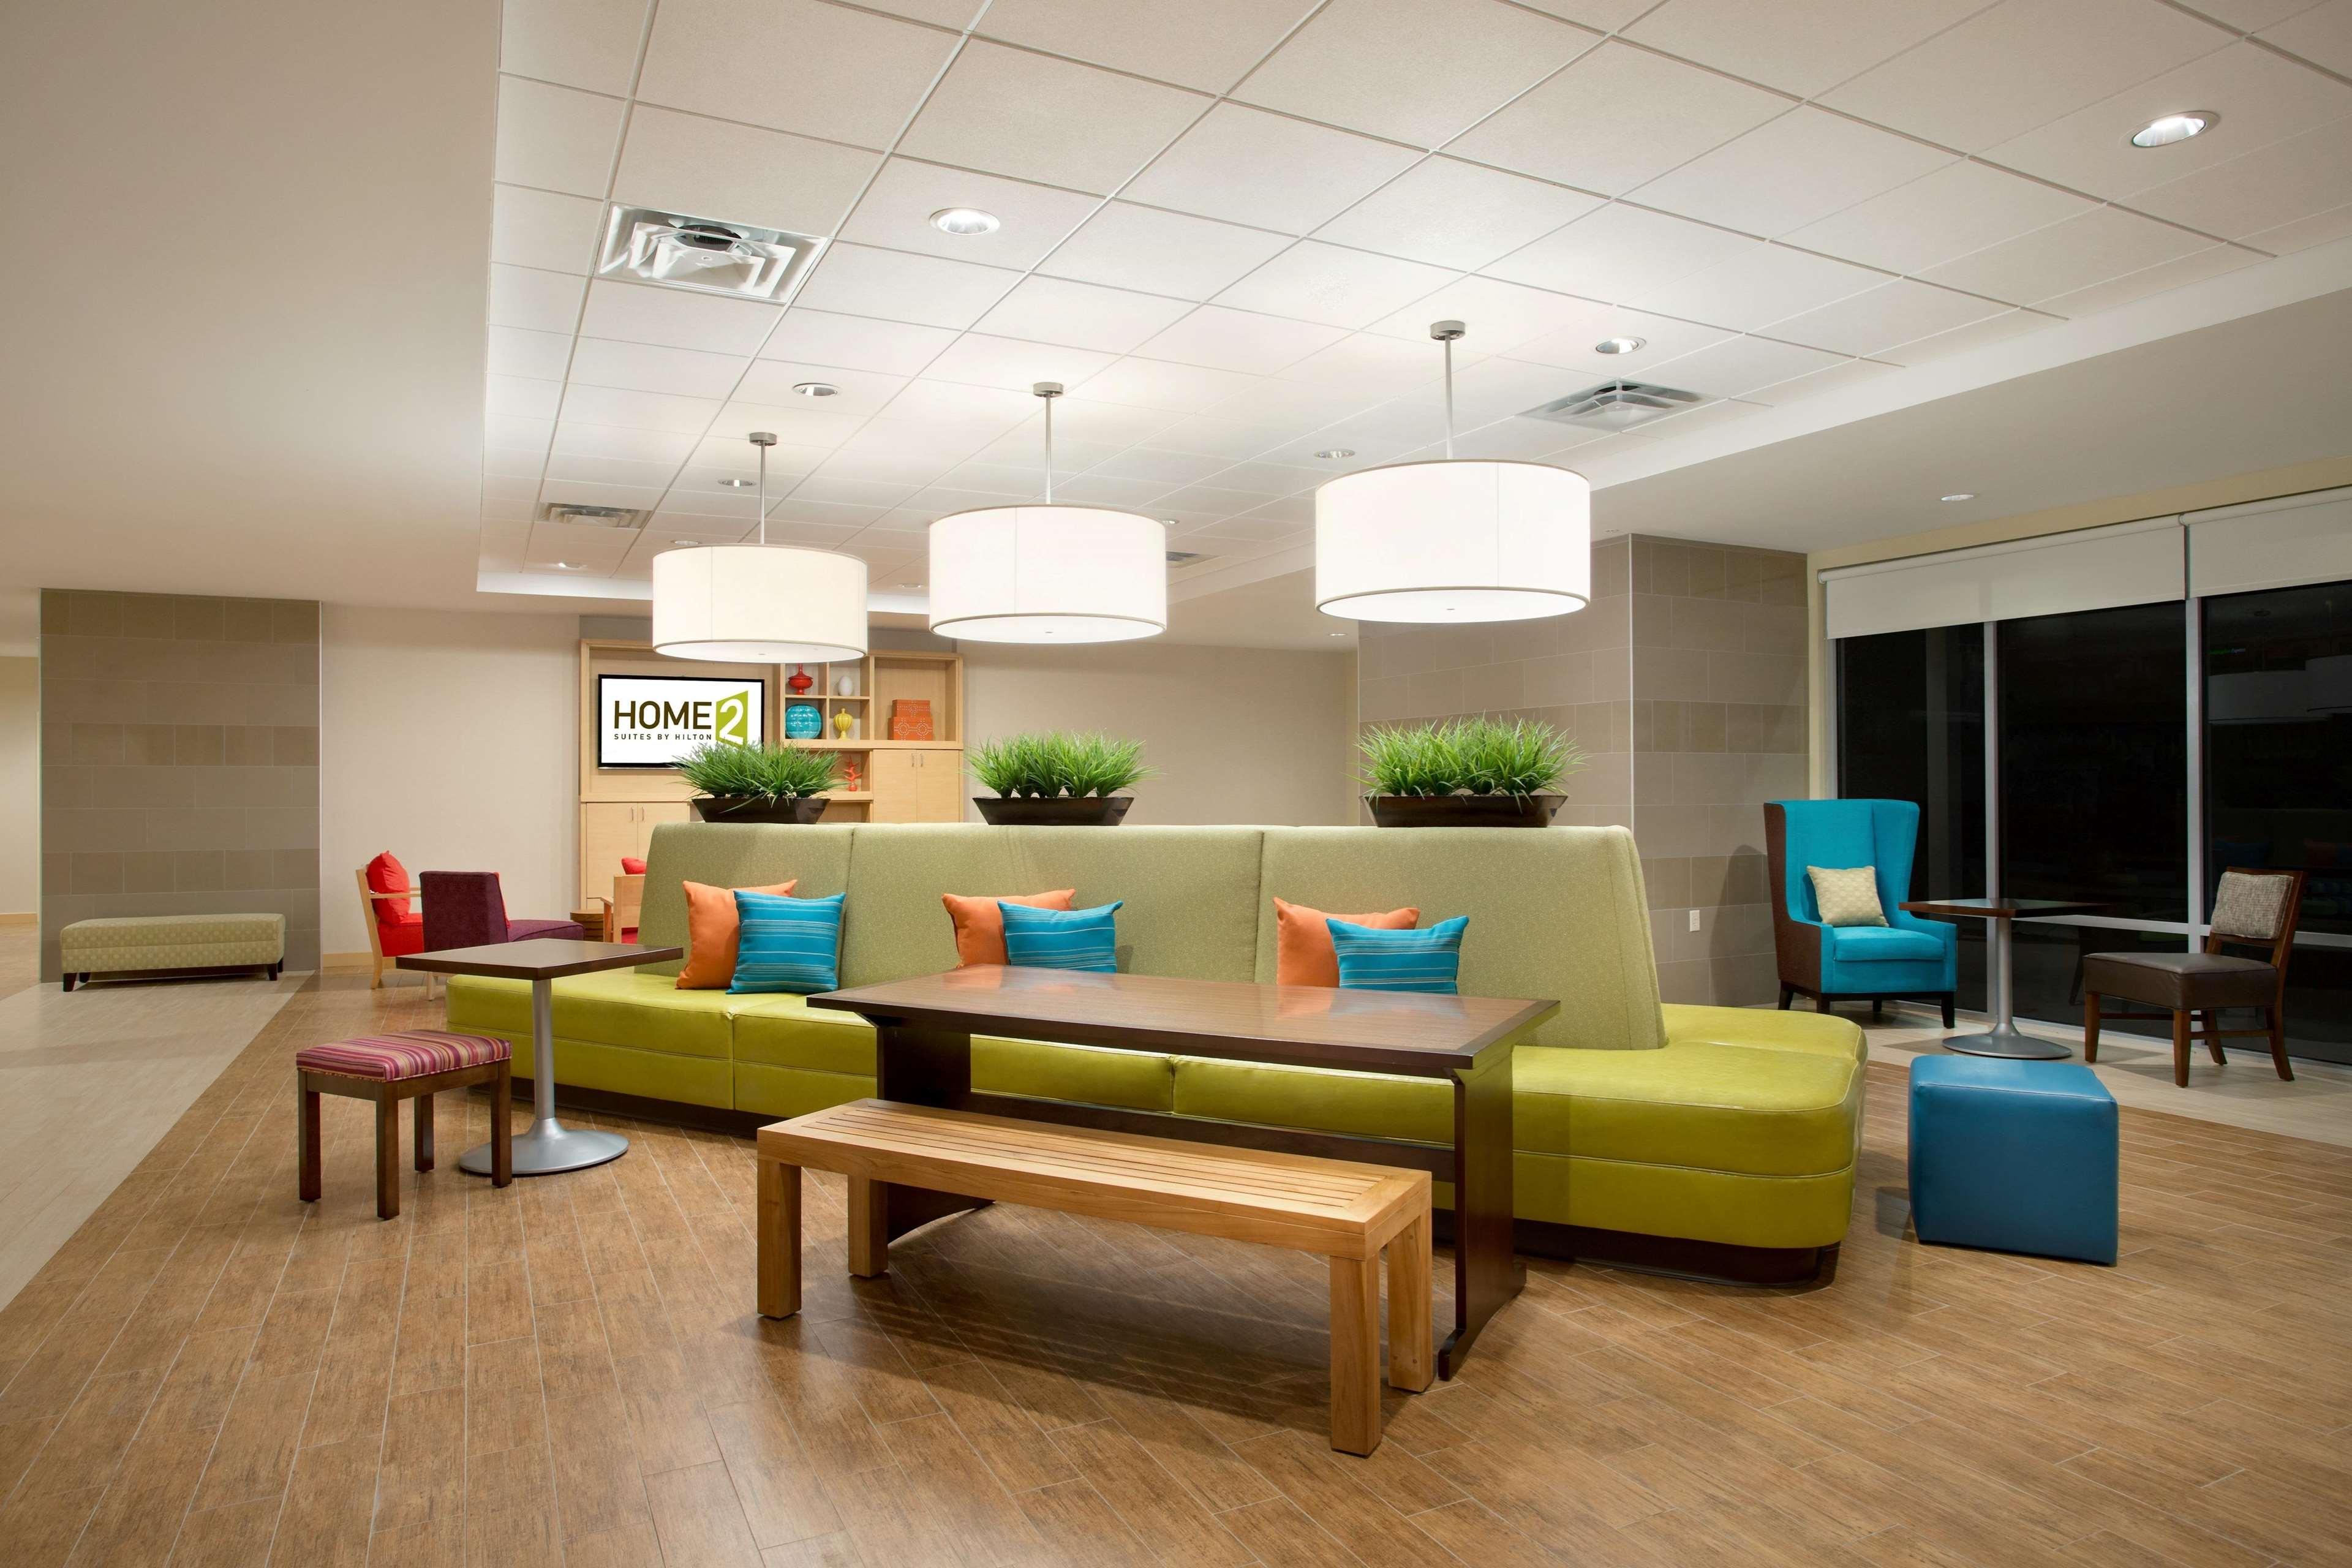 Home2 Suites by Hilton San Antonio Airport, TX image 5